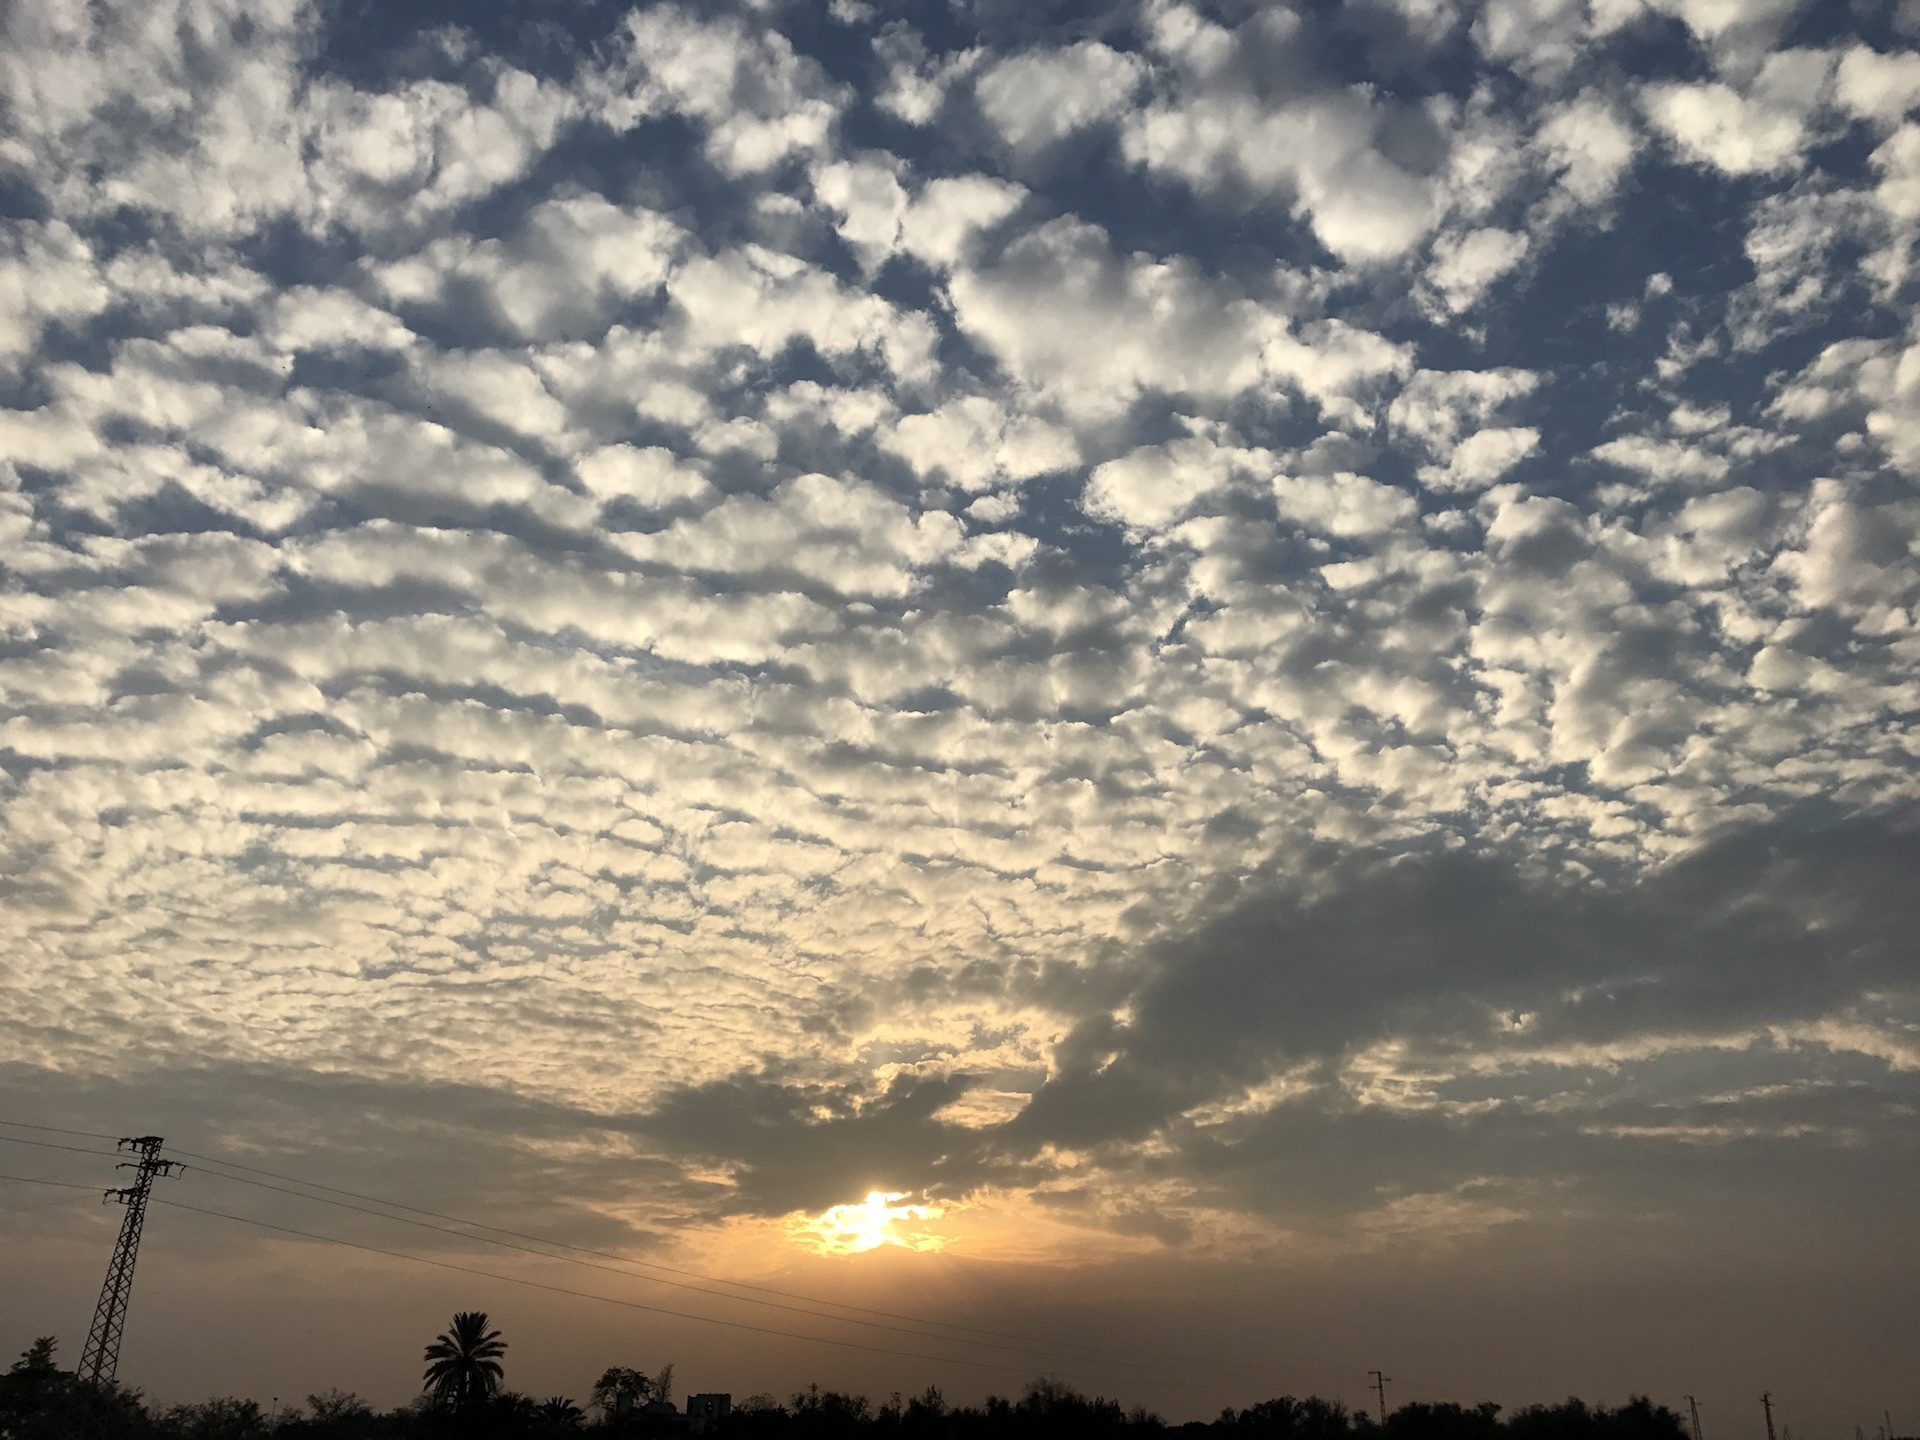 sol, atardecer, nubes, cúmulos, cielo - Fondos de Pantalla HD - professor-falken.com